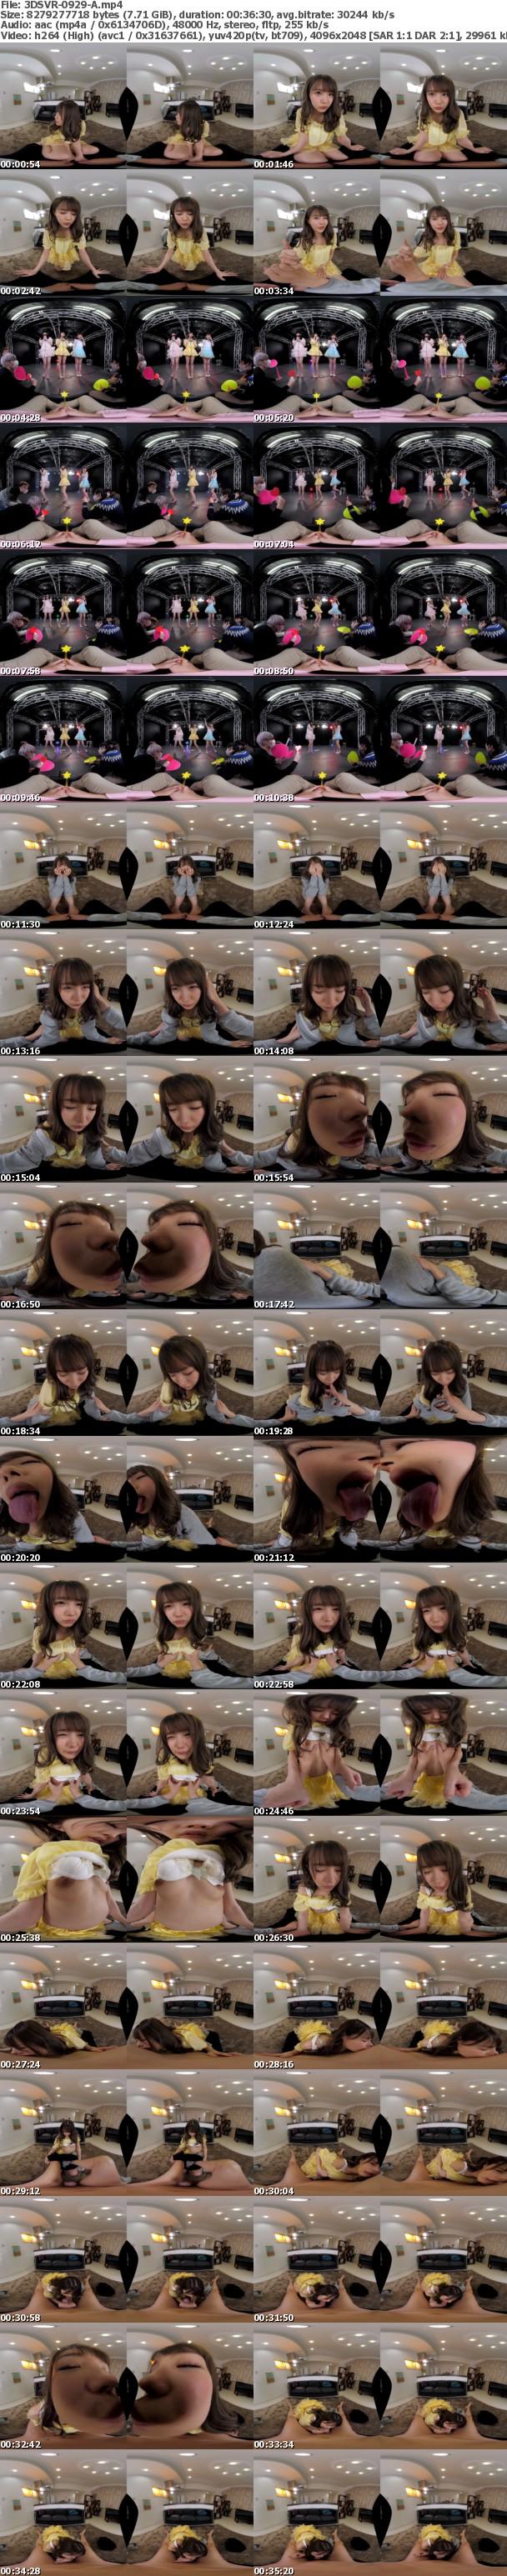 (VR) 3DSVR-0929 ライブ後に慰めてたら泣いちゃった…おパンツ丸見え大失態の幼馴染地下アイドルと泣き顔セックス 松本いちか